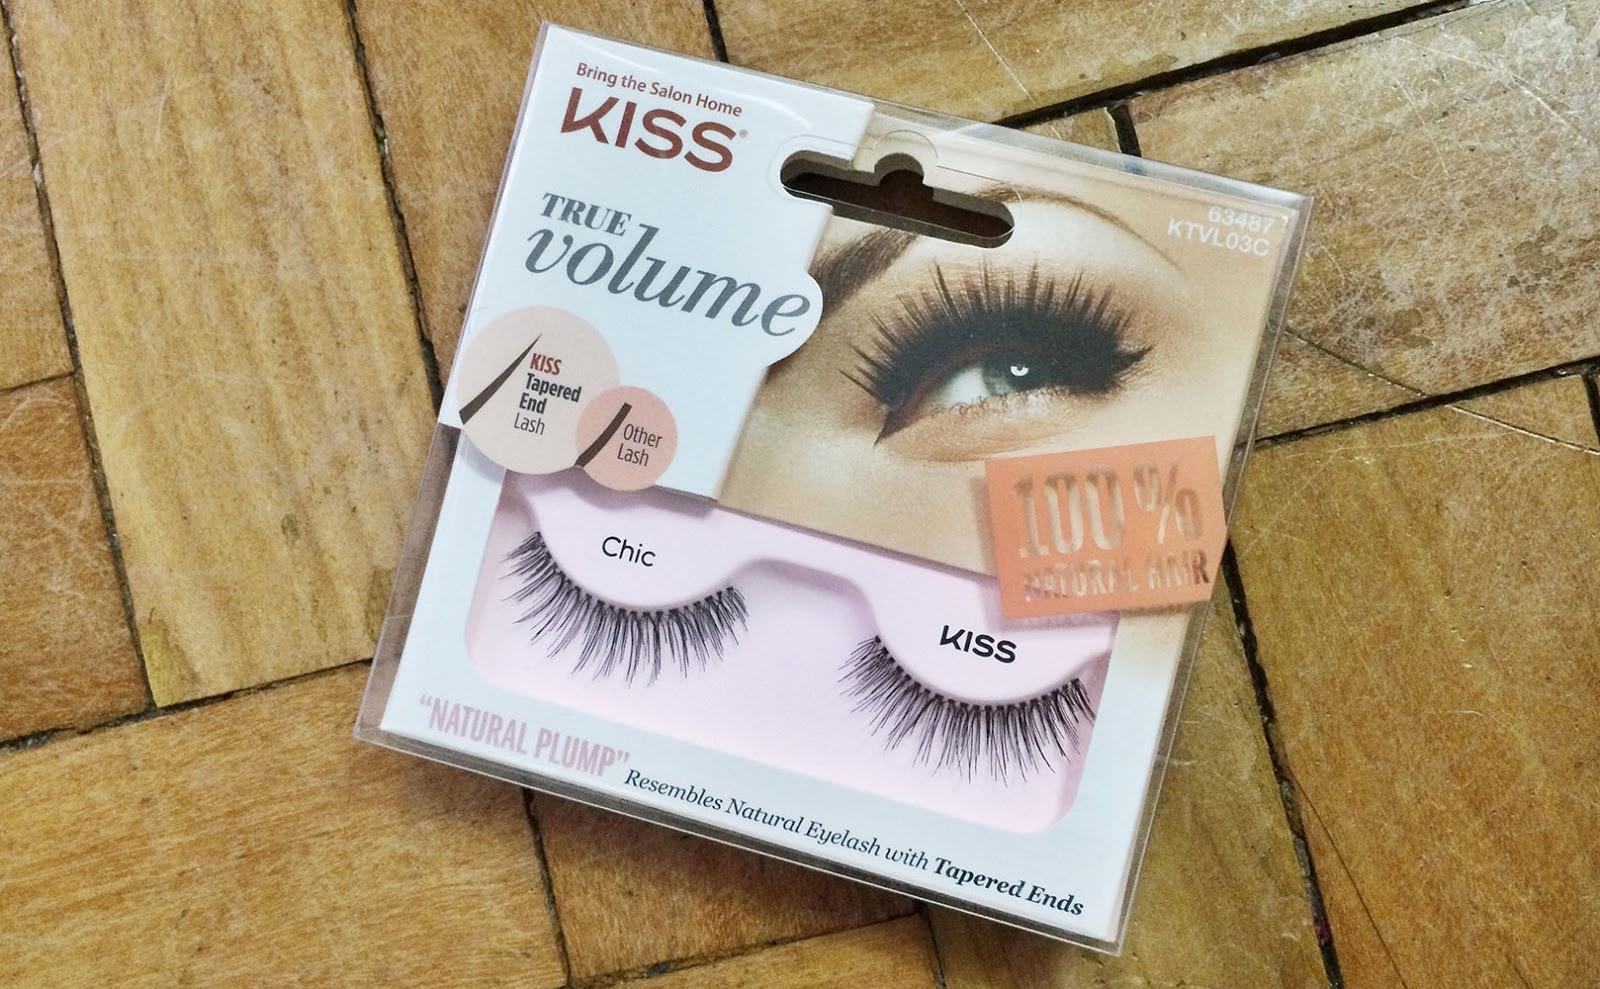 623e8b9a6e3 KISS True Volume Lashes Chic Review When it comes to false eyelashes ...